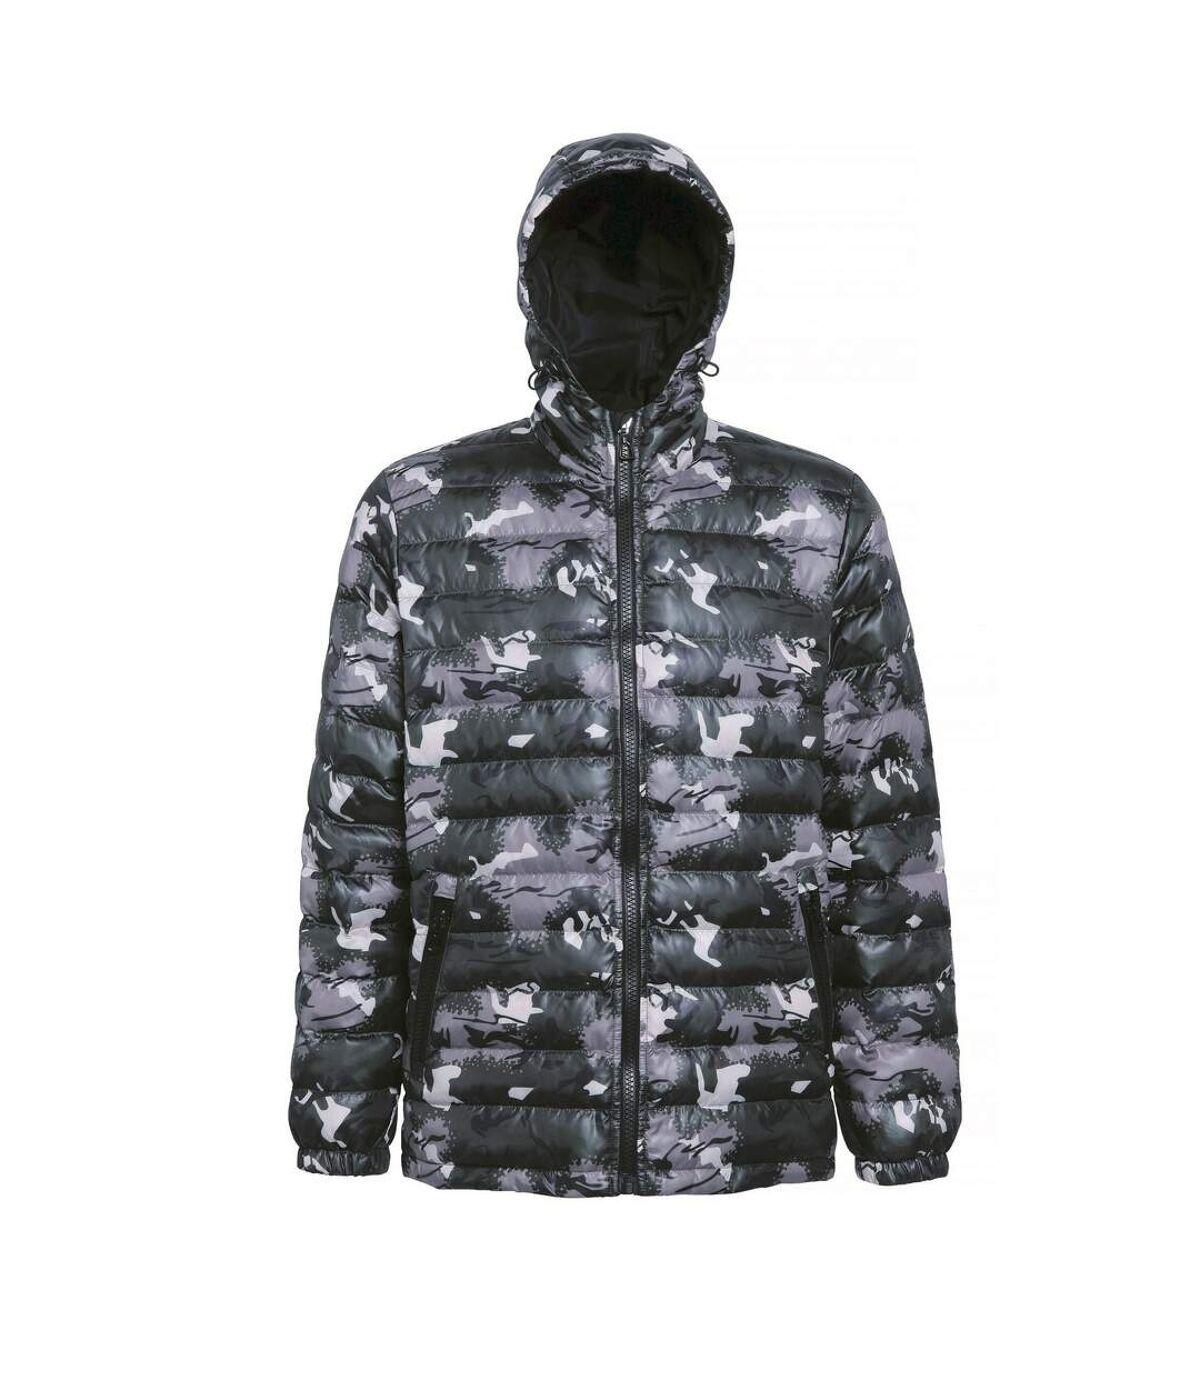 2786 Mens Hooded Water & Wind Resistant Padded Jacket (Camo Green) - UTRW3424